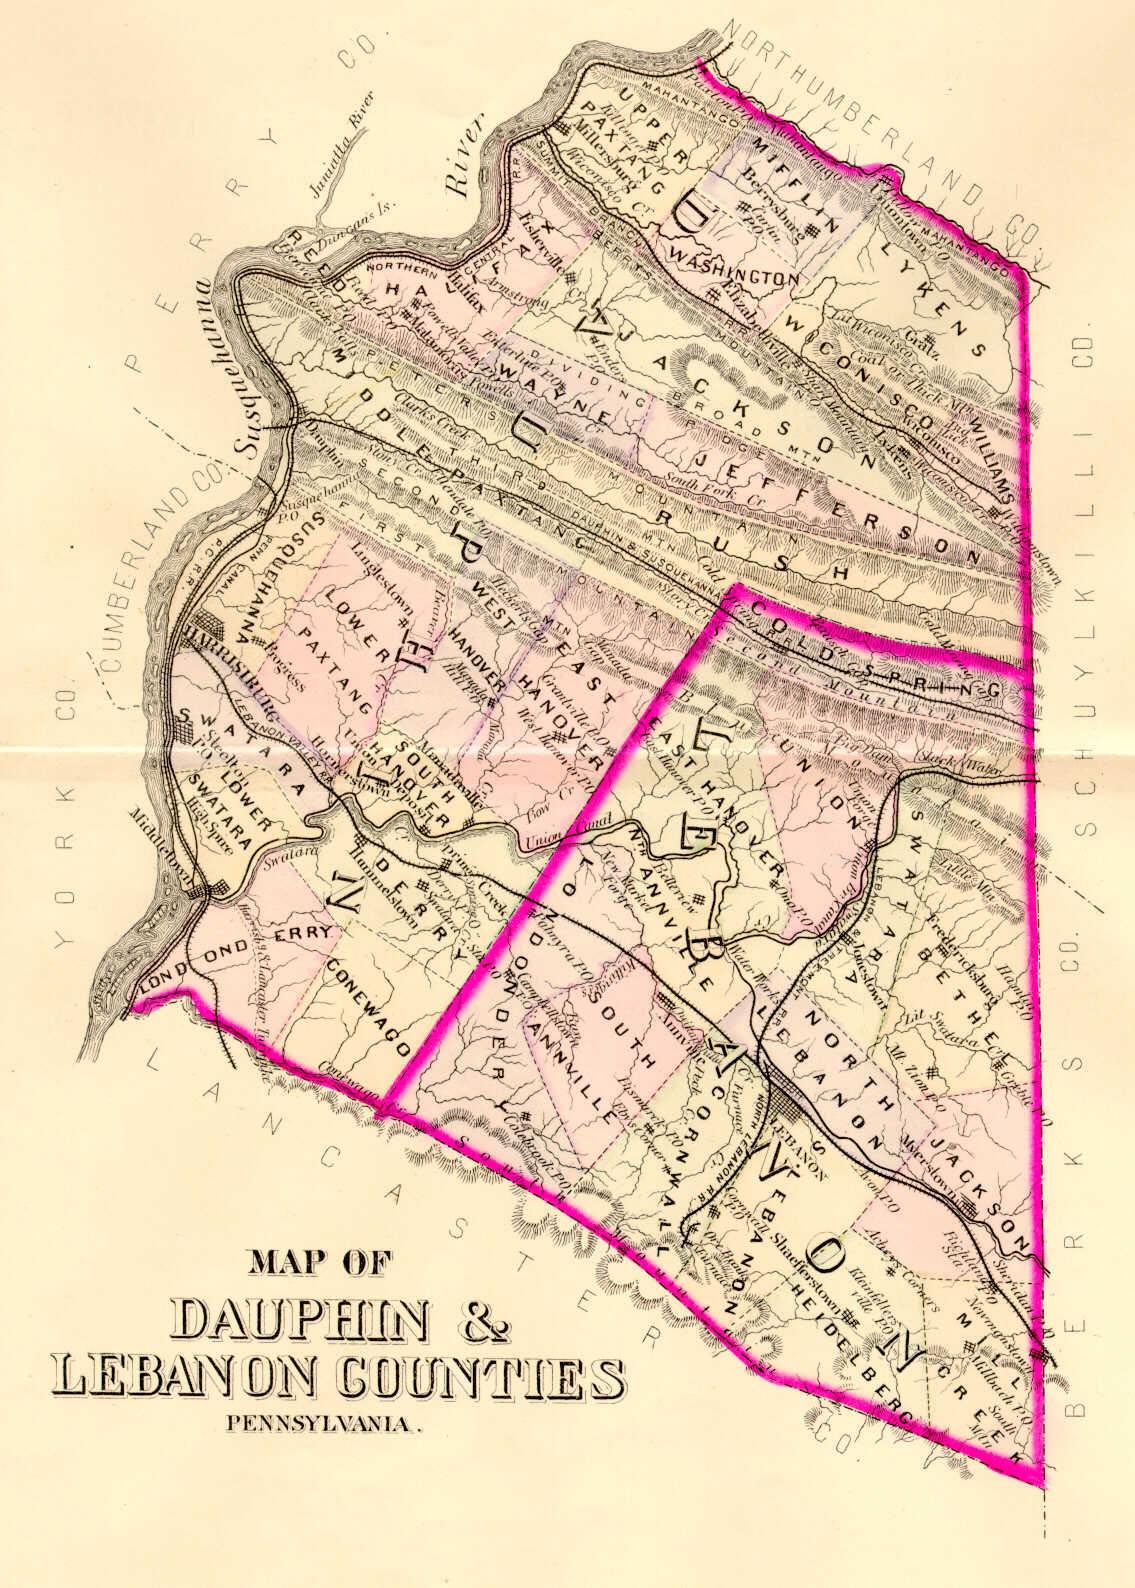 Early Landowners Of Dauphin County - Dauphin county on us map